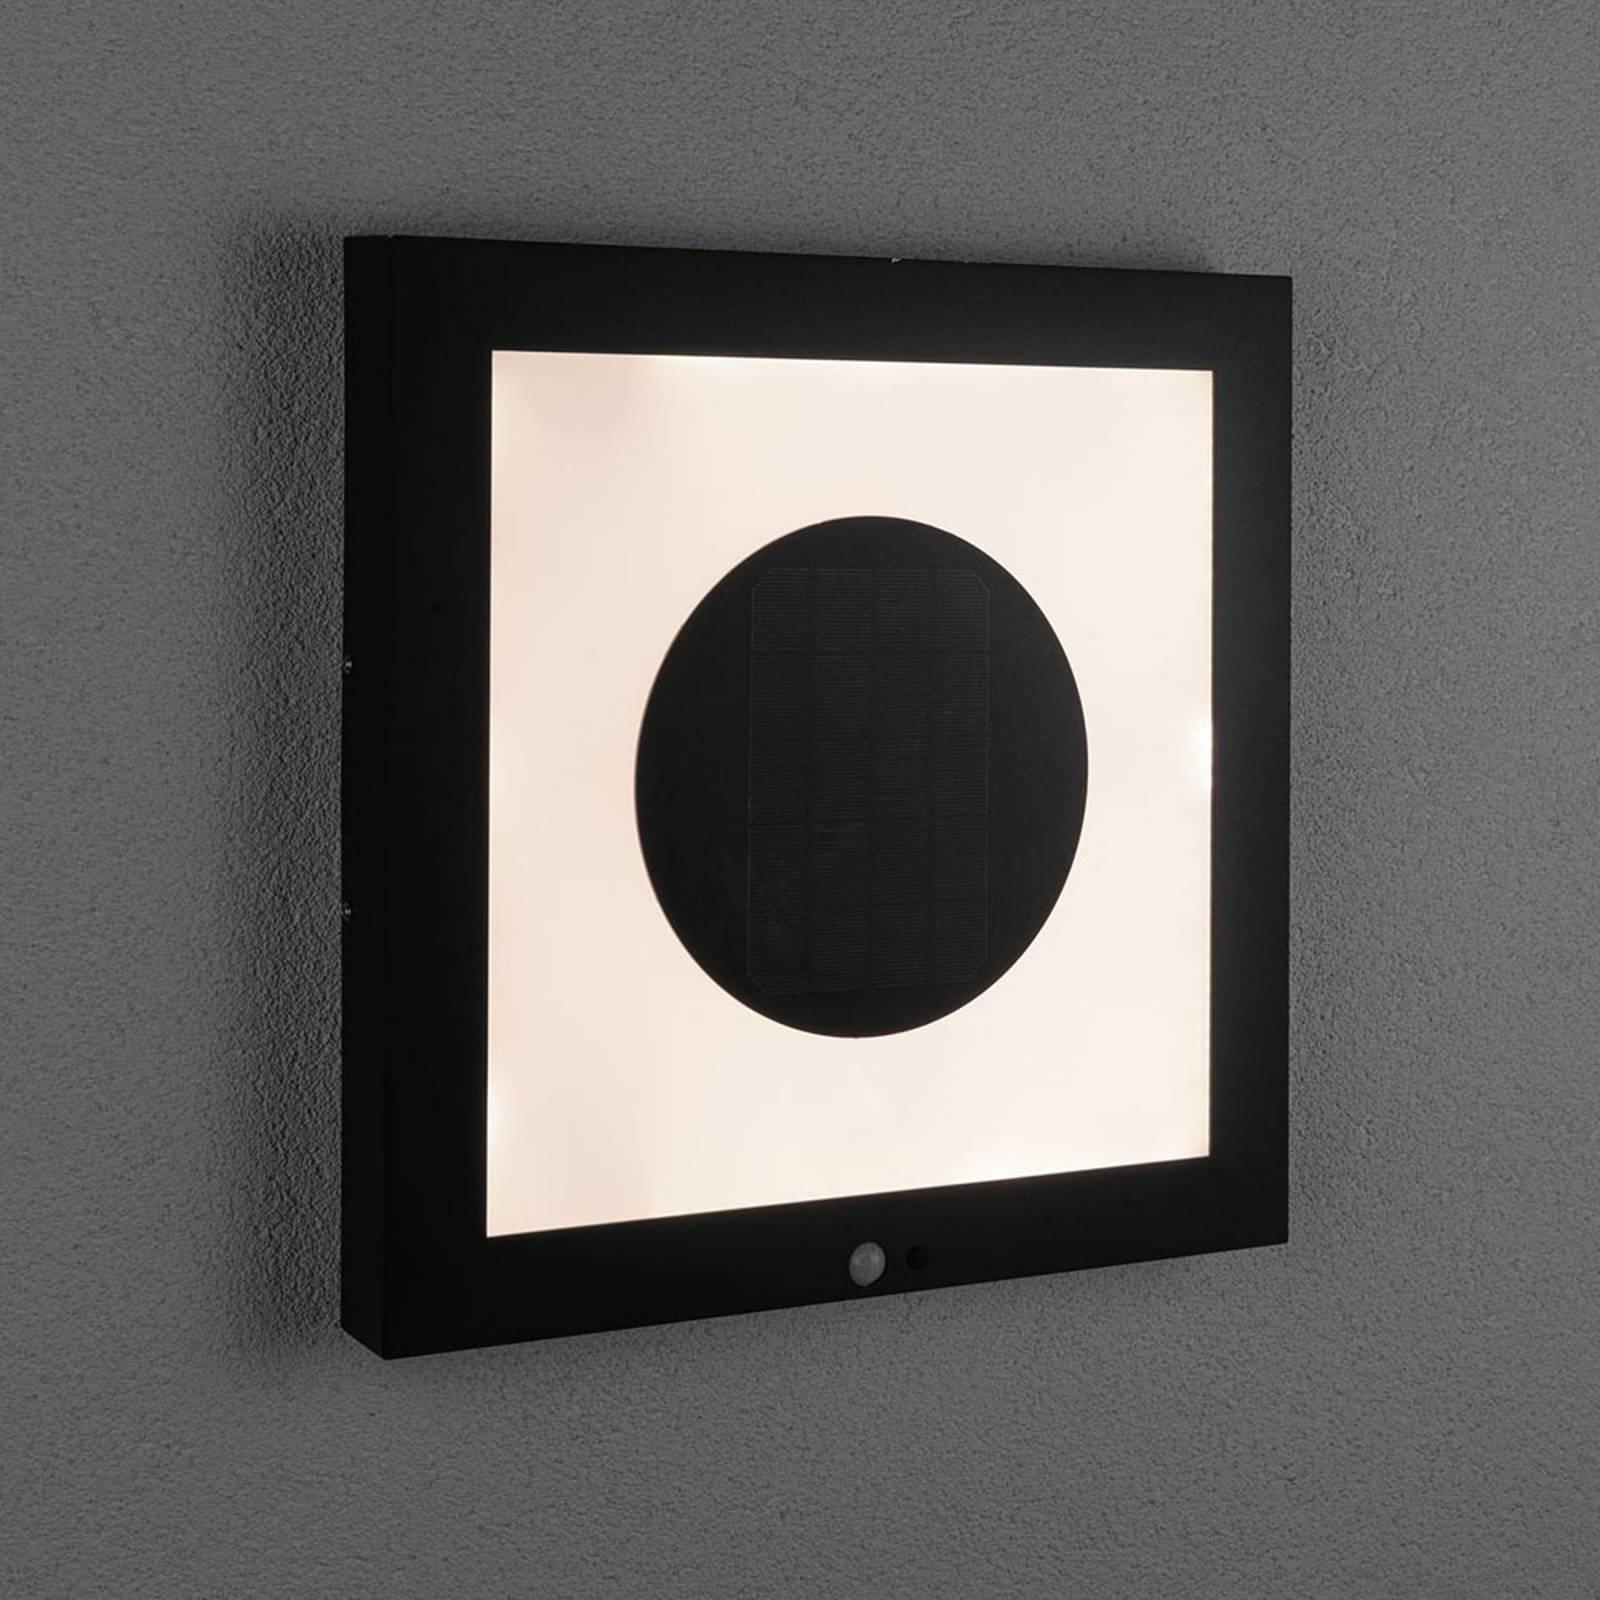 Paulmann -LED-aurinkopaneeli Taija 40 x 40 cm